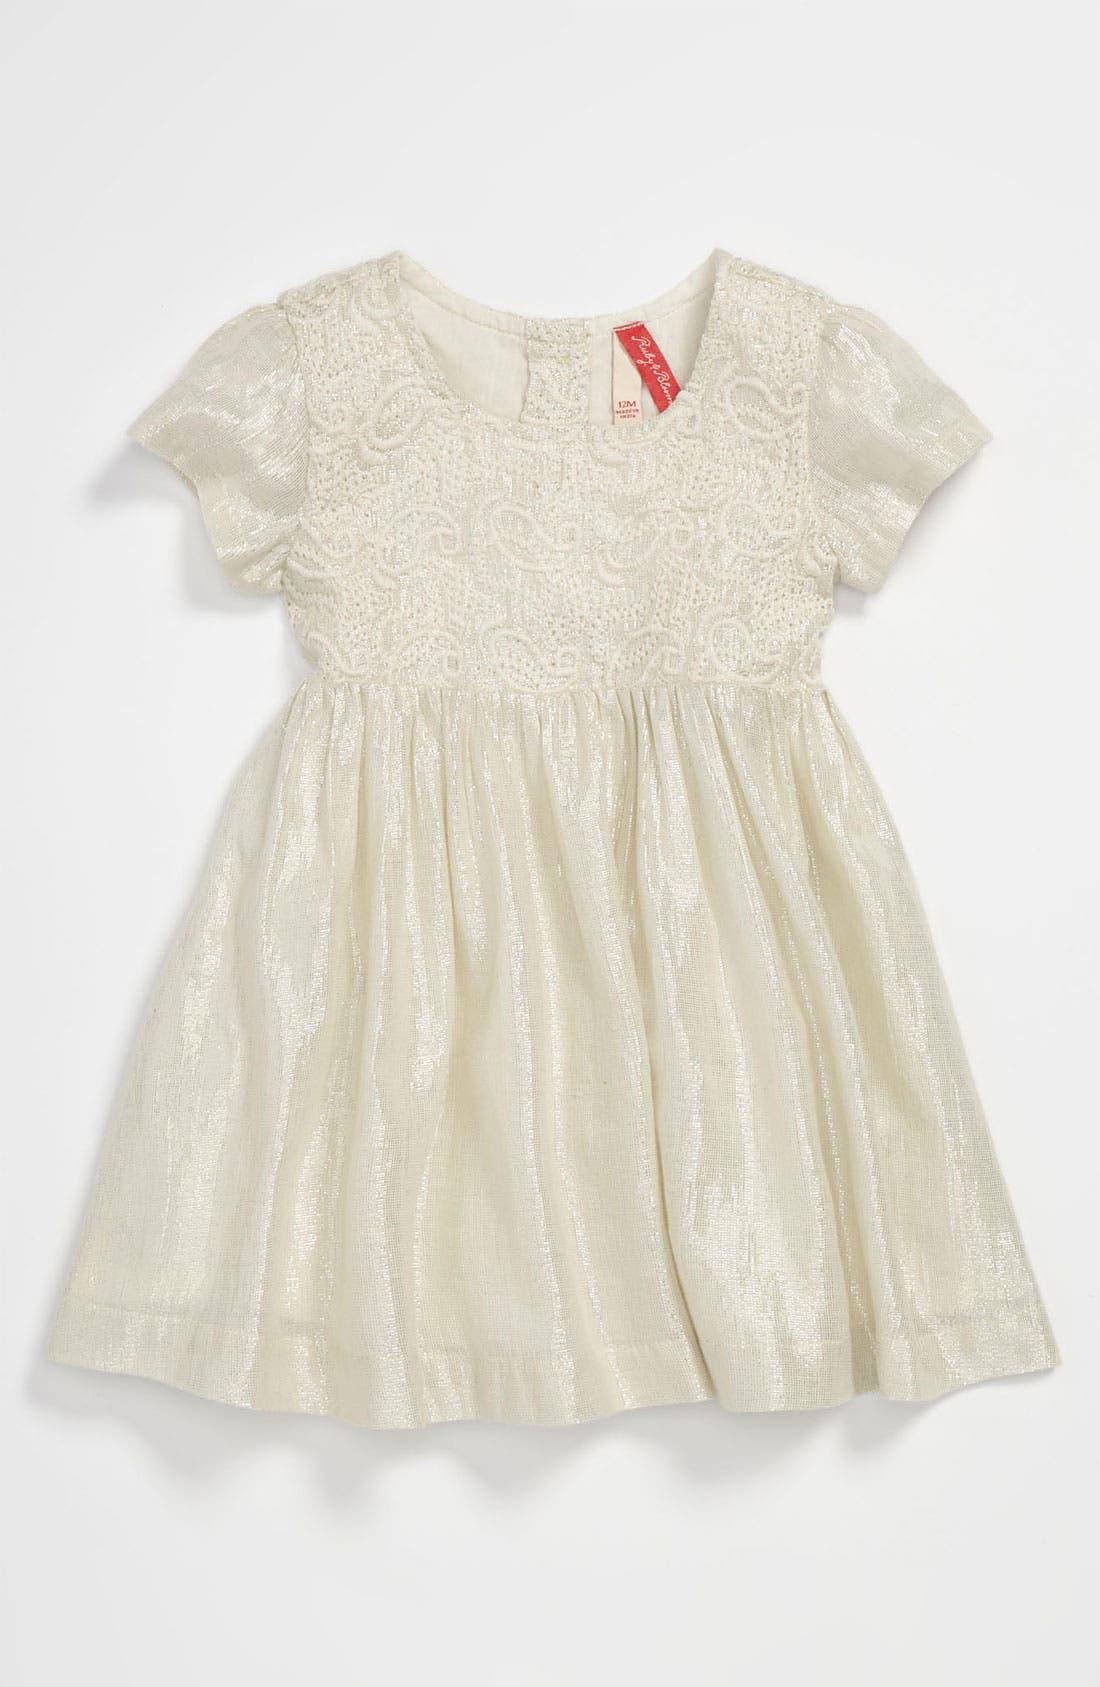 Main Image - Ruby & Bloom 'Giselle' Dress (Infant)